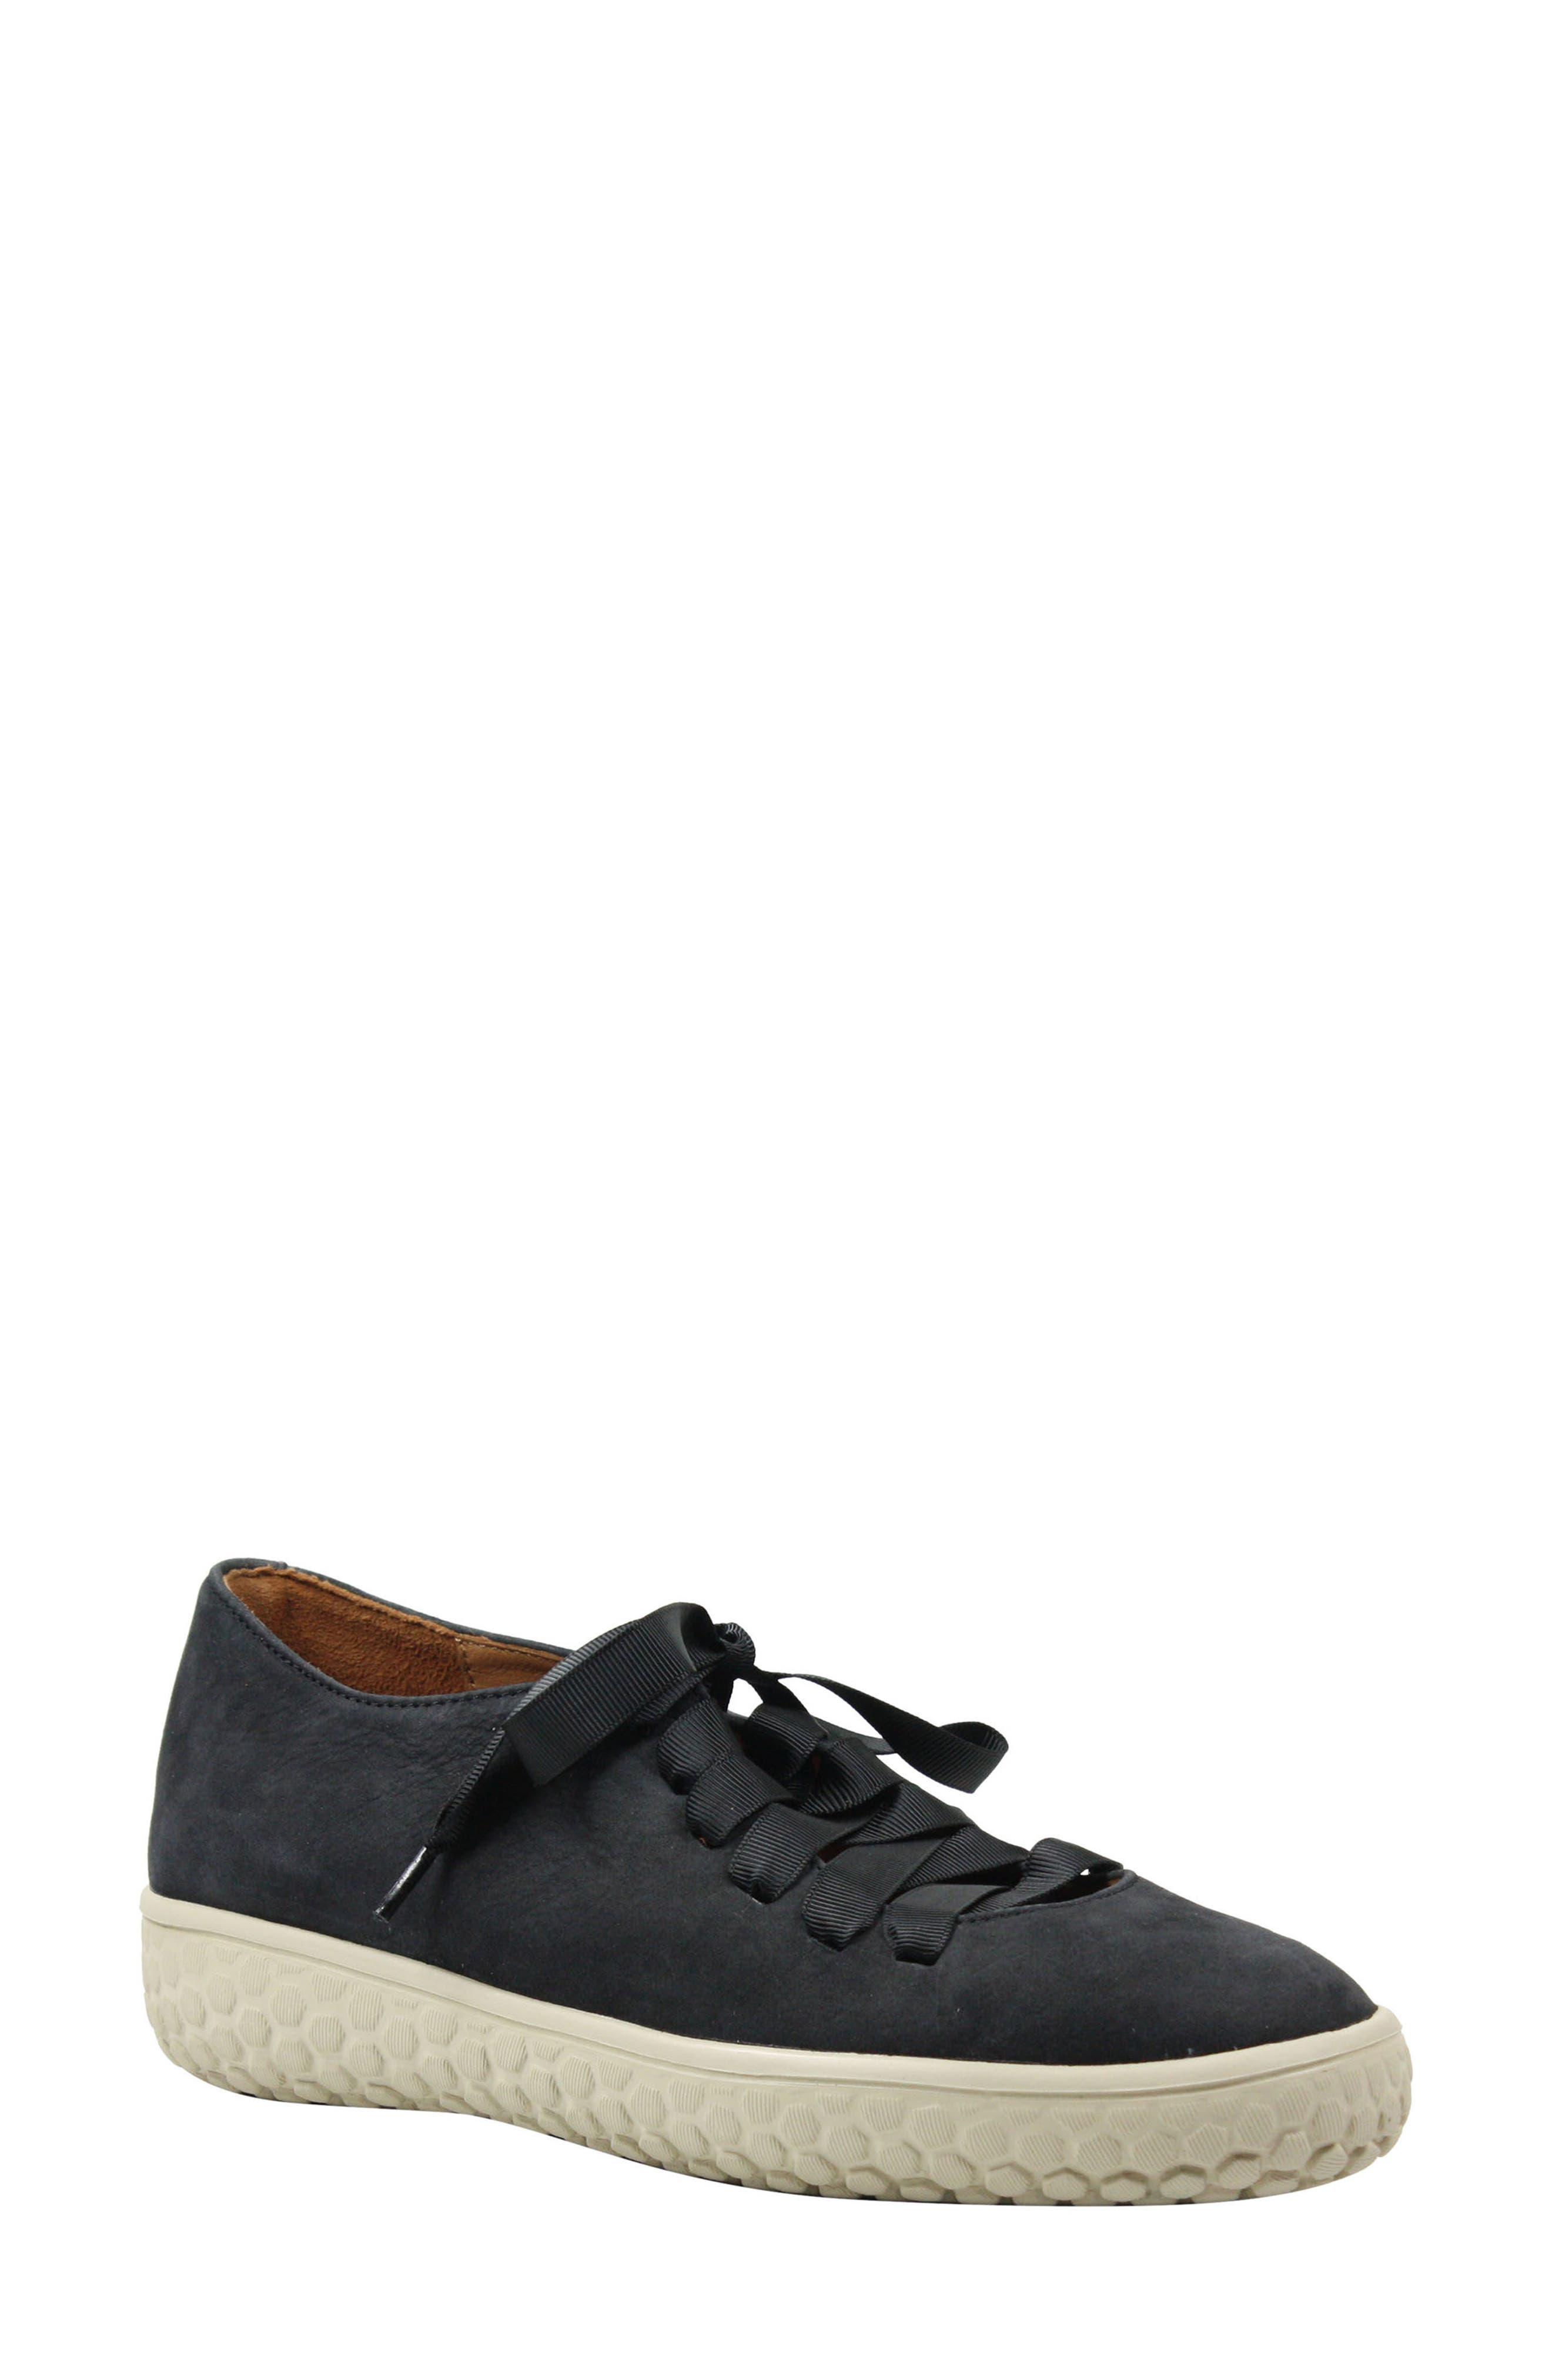 L'AMOUR DES PIEDS, Zaheera Sneaker, Main thumbnail 1, color, BLACK NUBUCK LEATHER